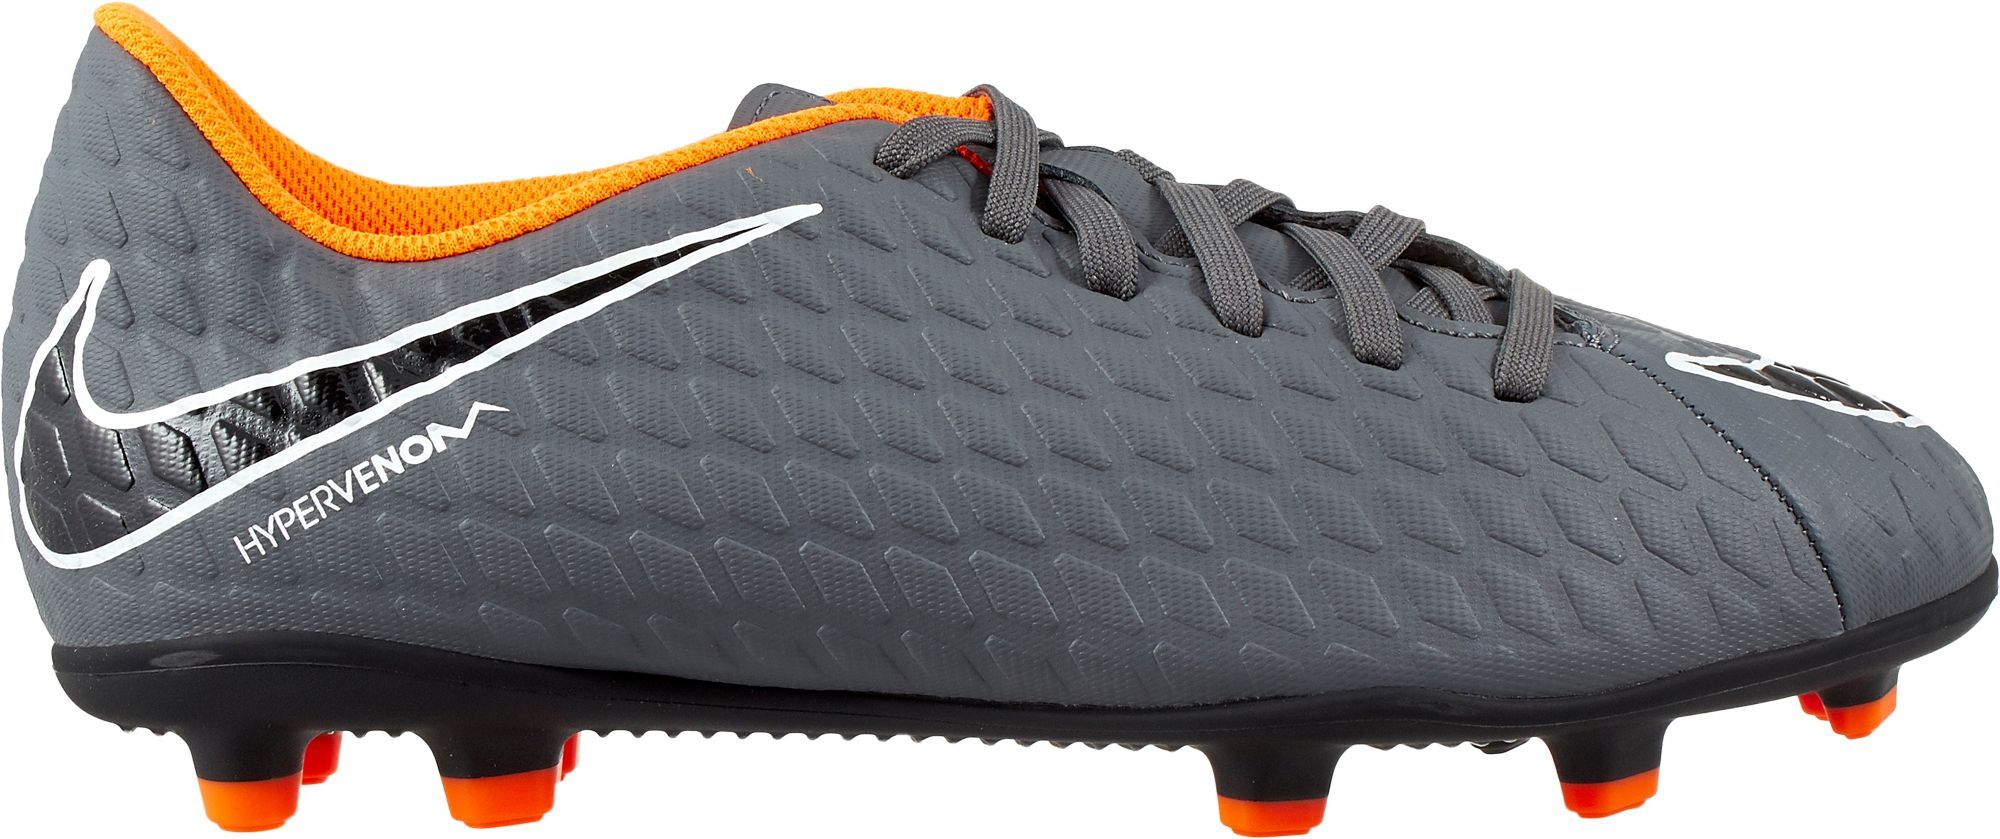 detailed pictures 976e2 e298a Nike Kids  Hypervenom Phantom 3 Club FG Soccer Cleats, Boy s, Size  2.0,  Gray